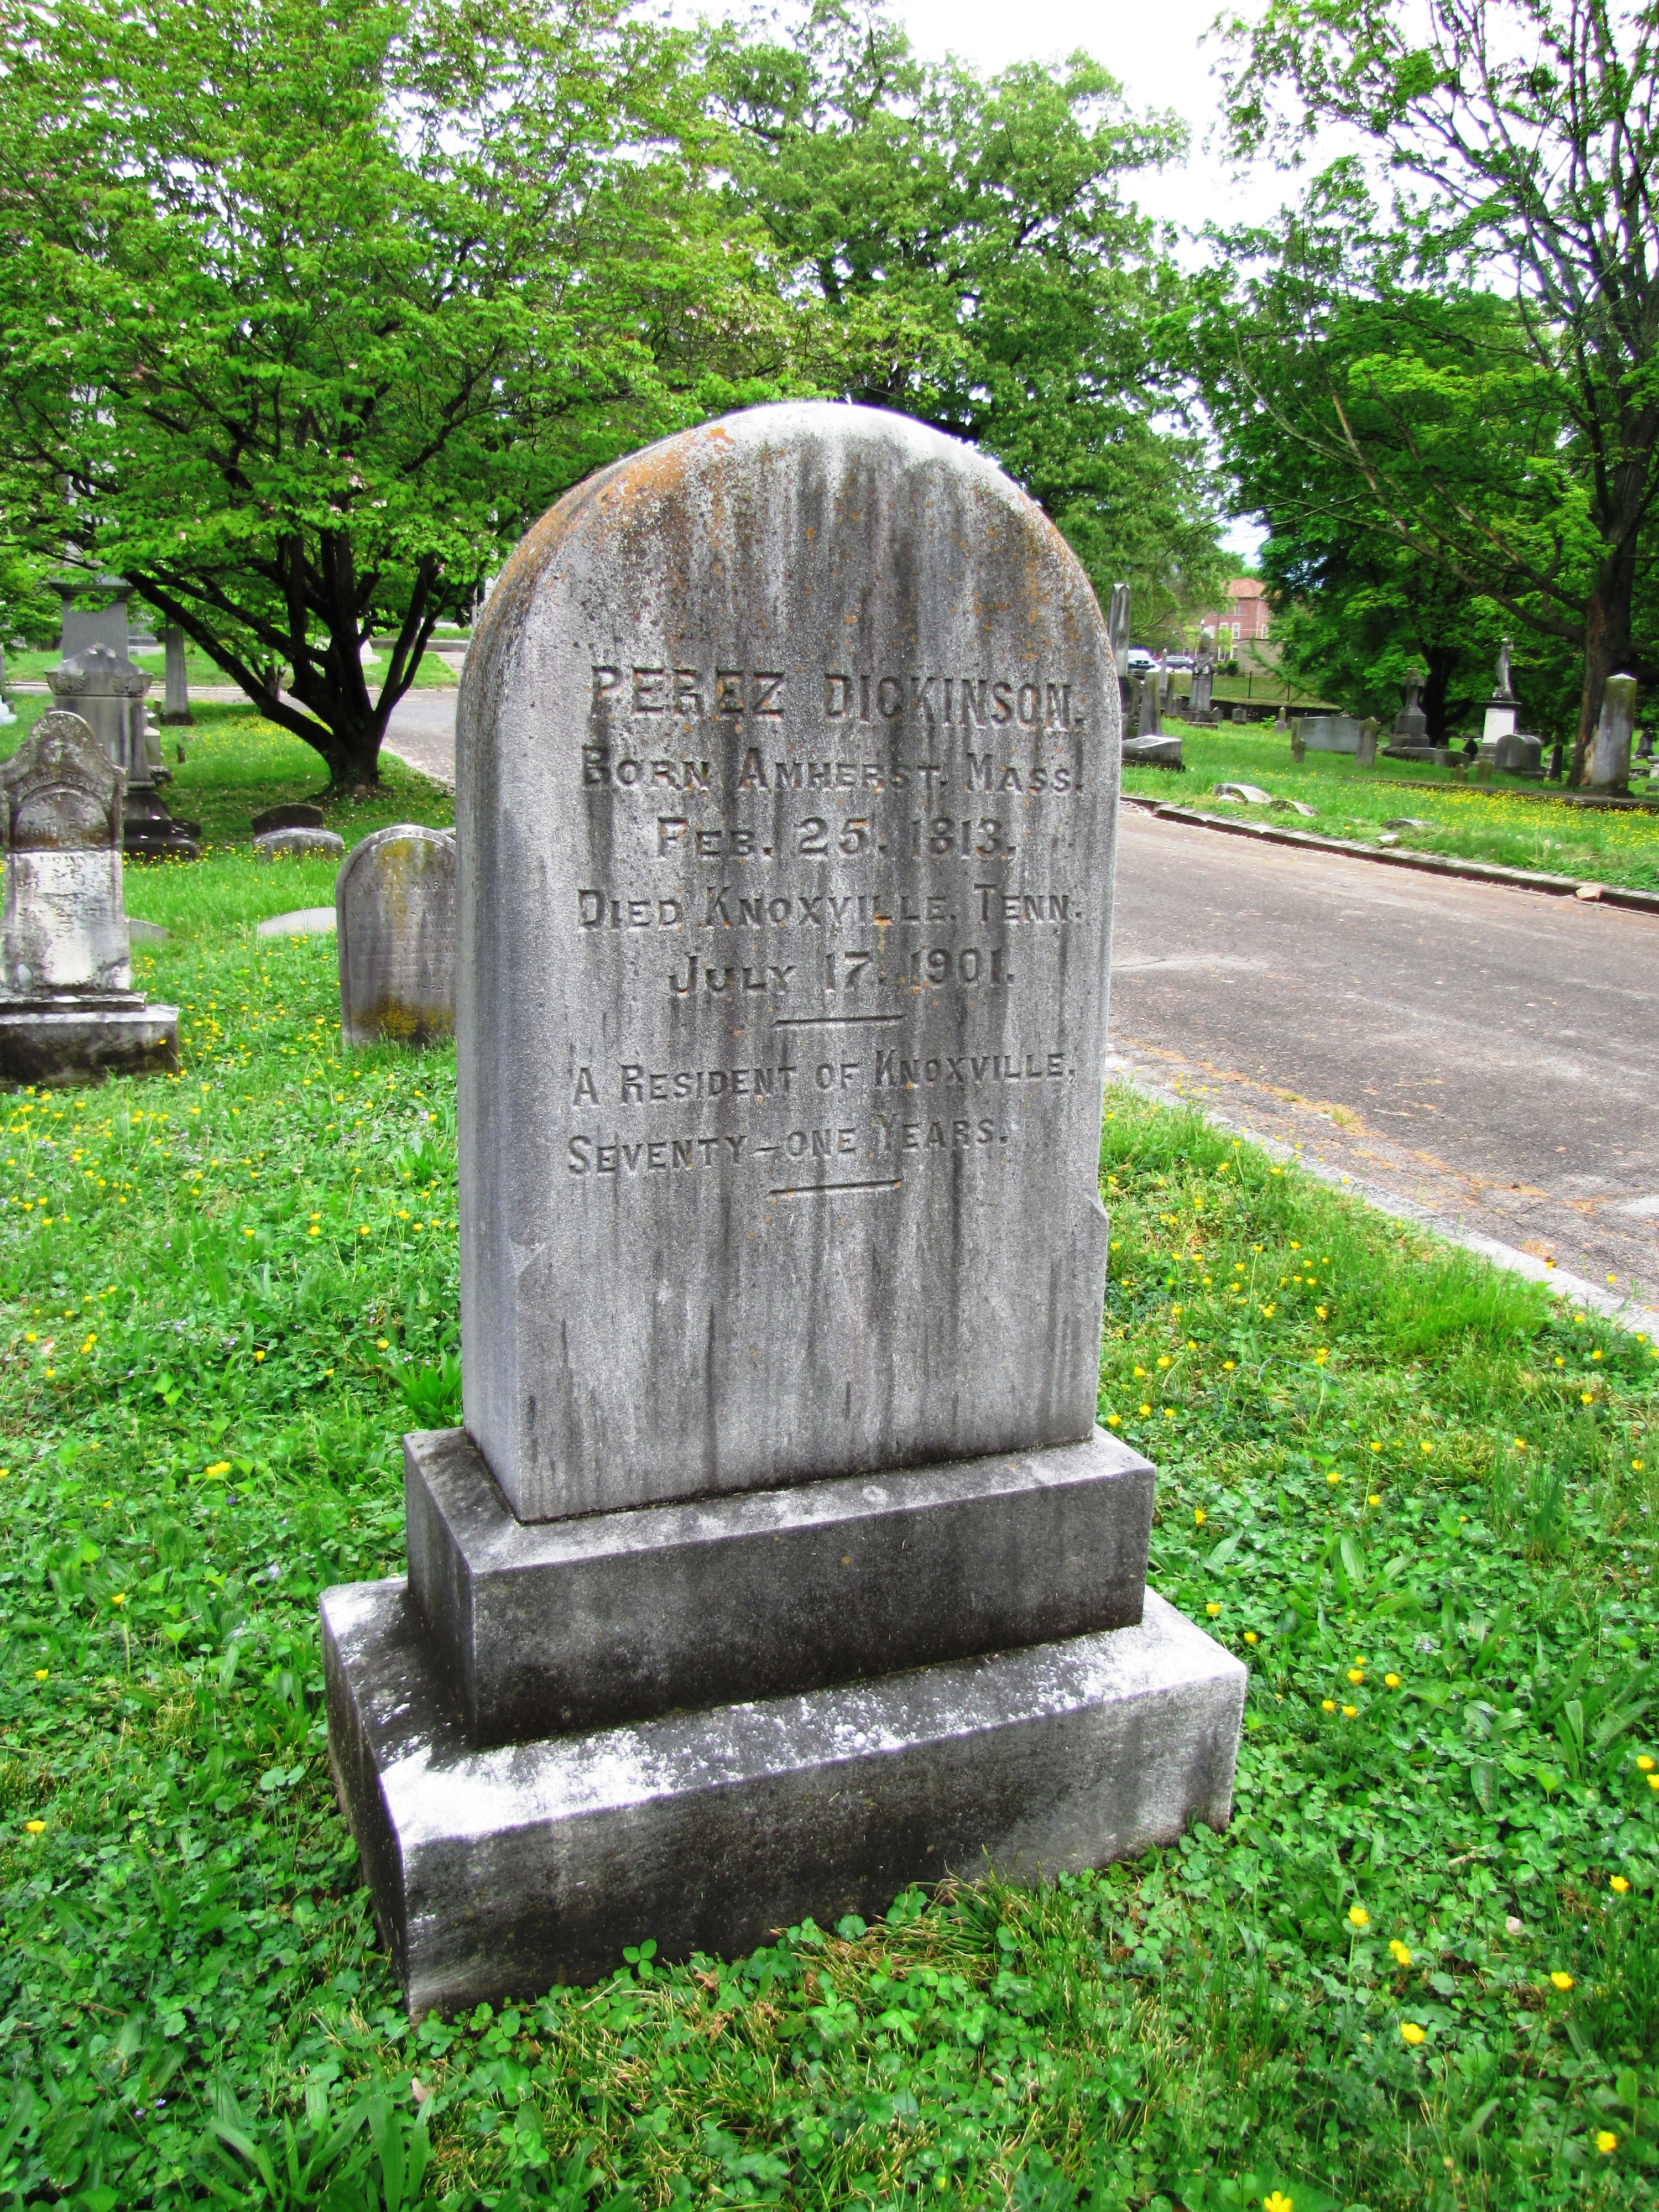 File:Perez-dickinson-grave-old-gray-tn1.jpg - Wikimedia Commons